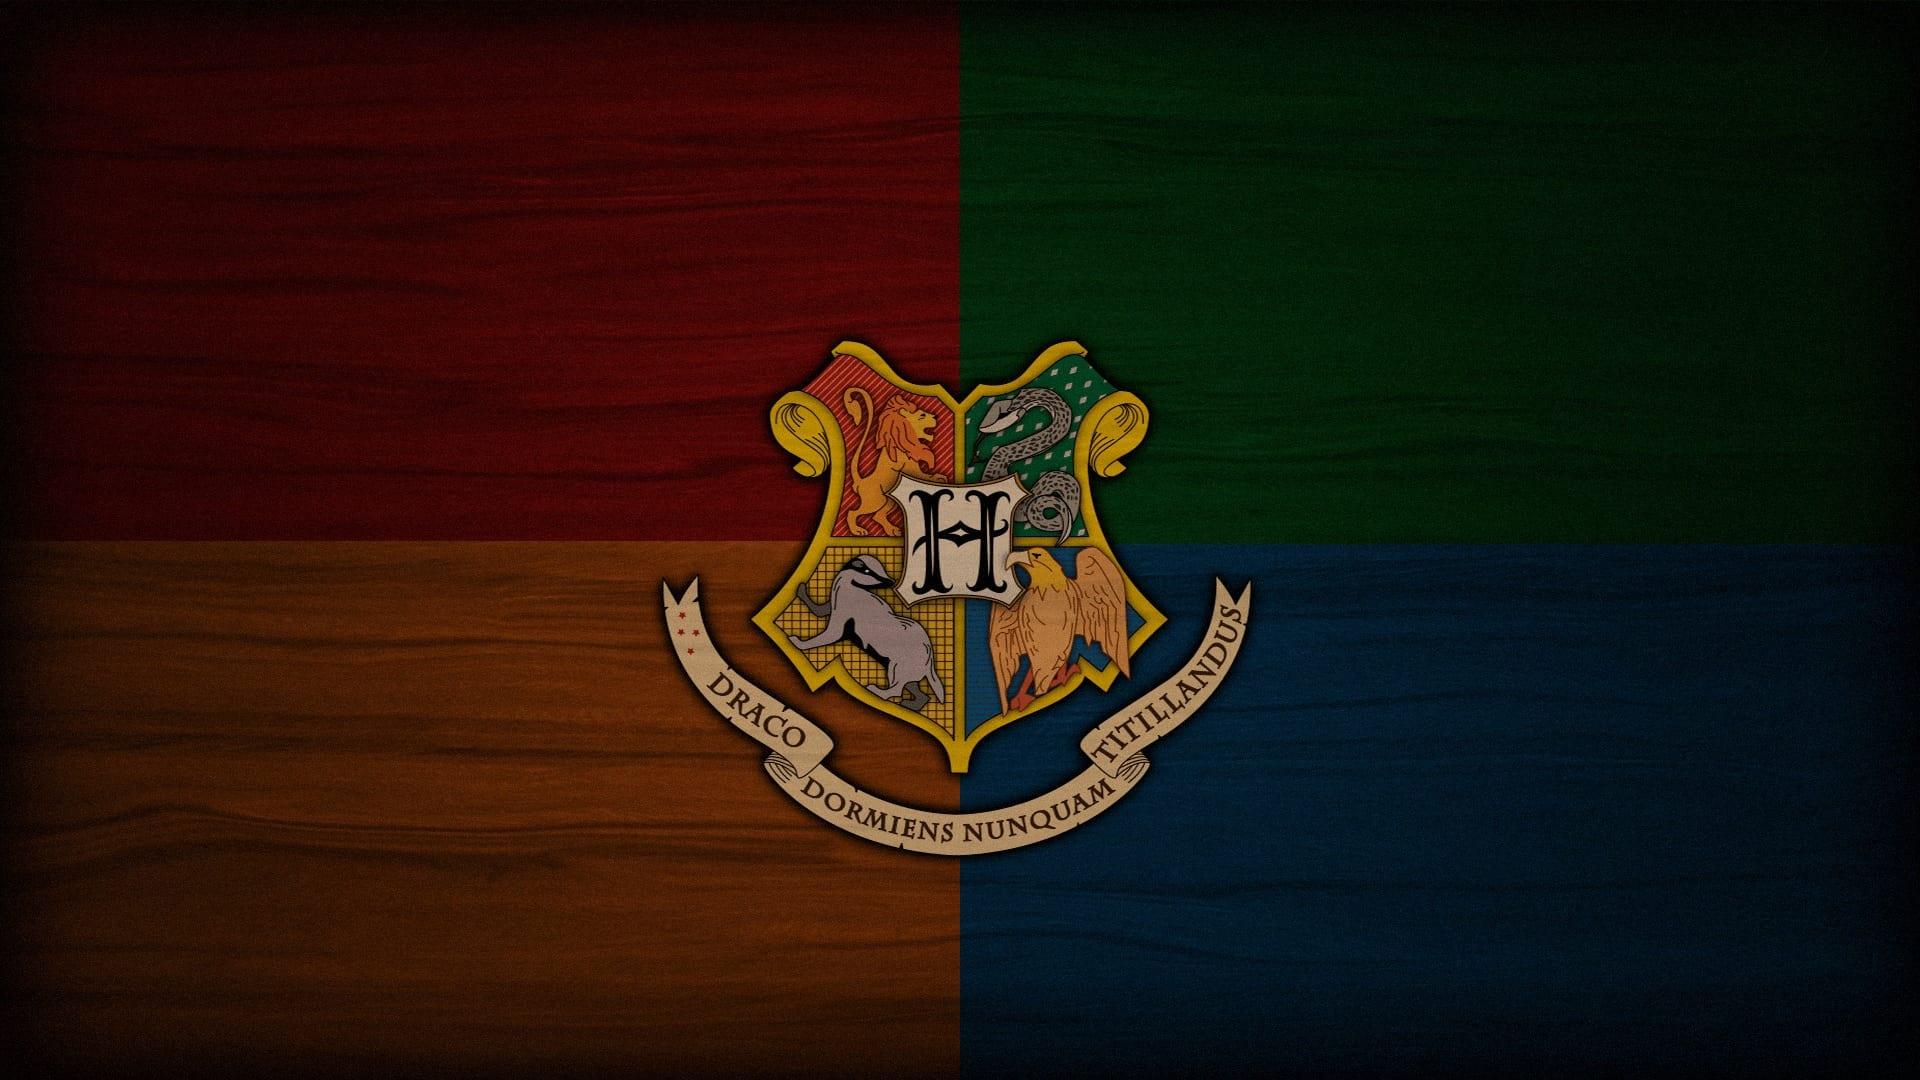 hogwarts house, harry potter